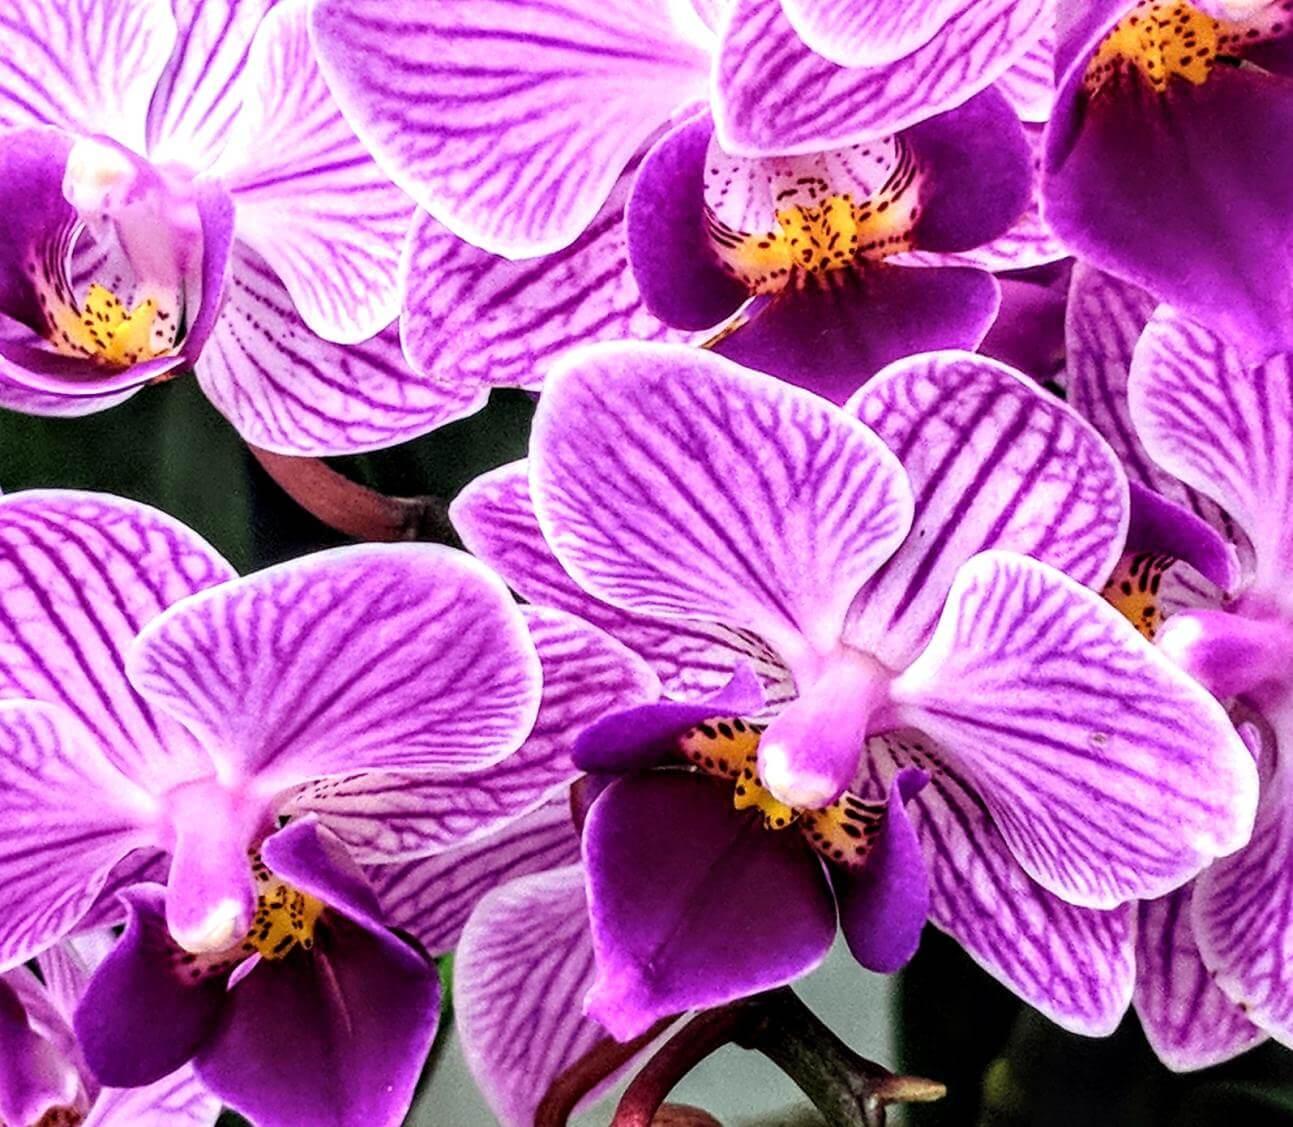 Purple Orchids - Original image